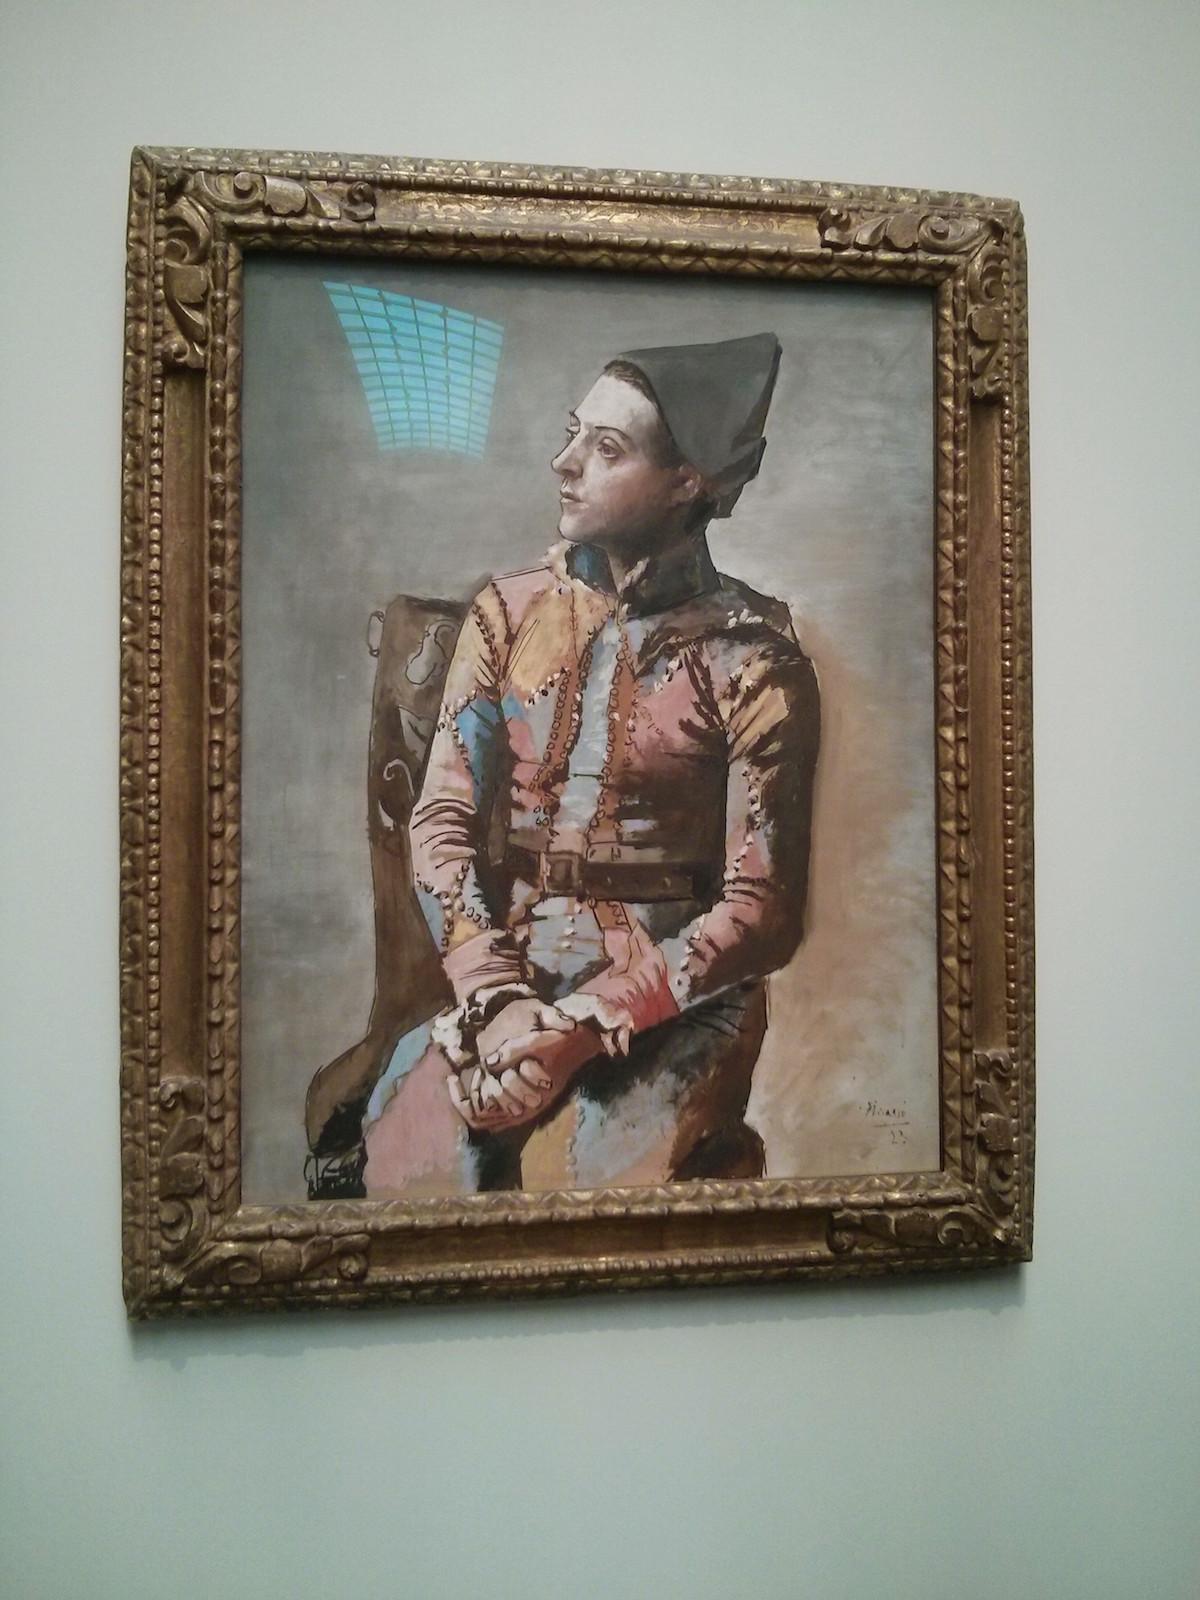 L'arlequin Picasso - El Prado - Madrid